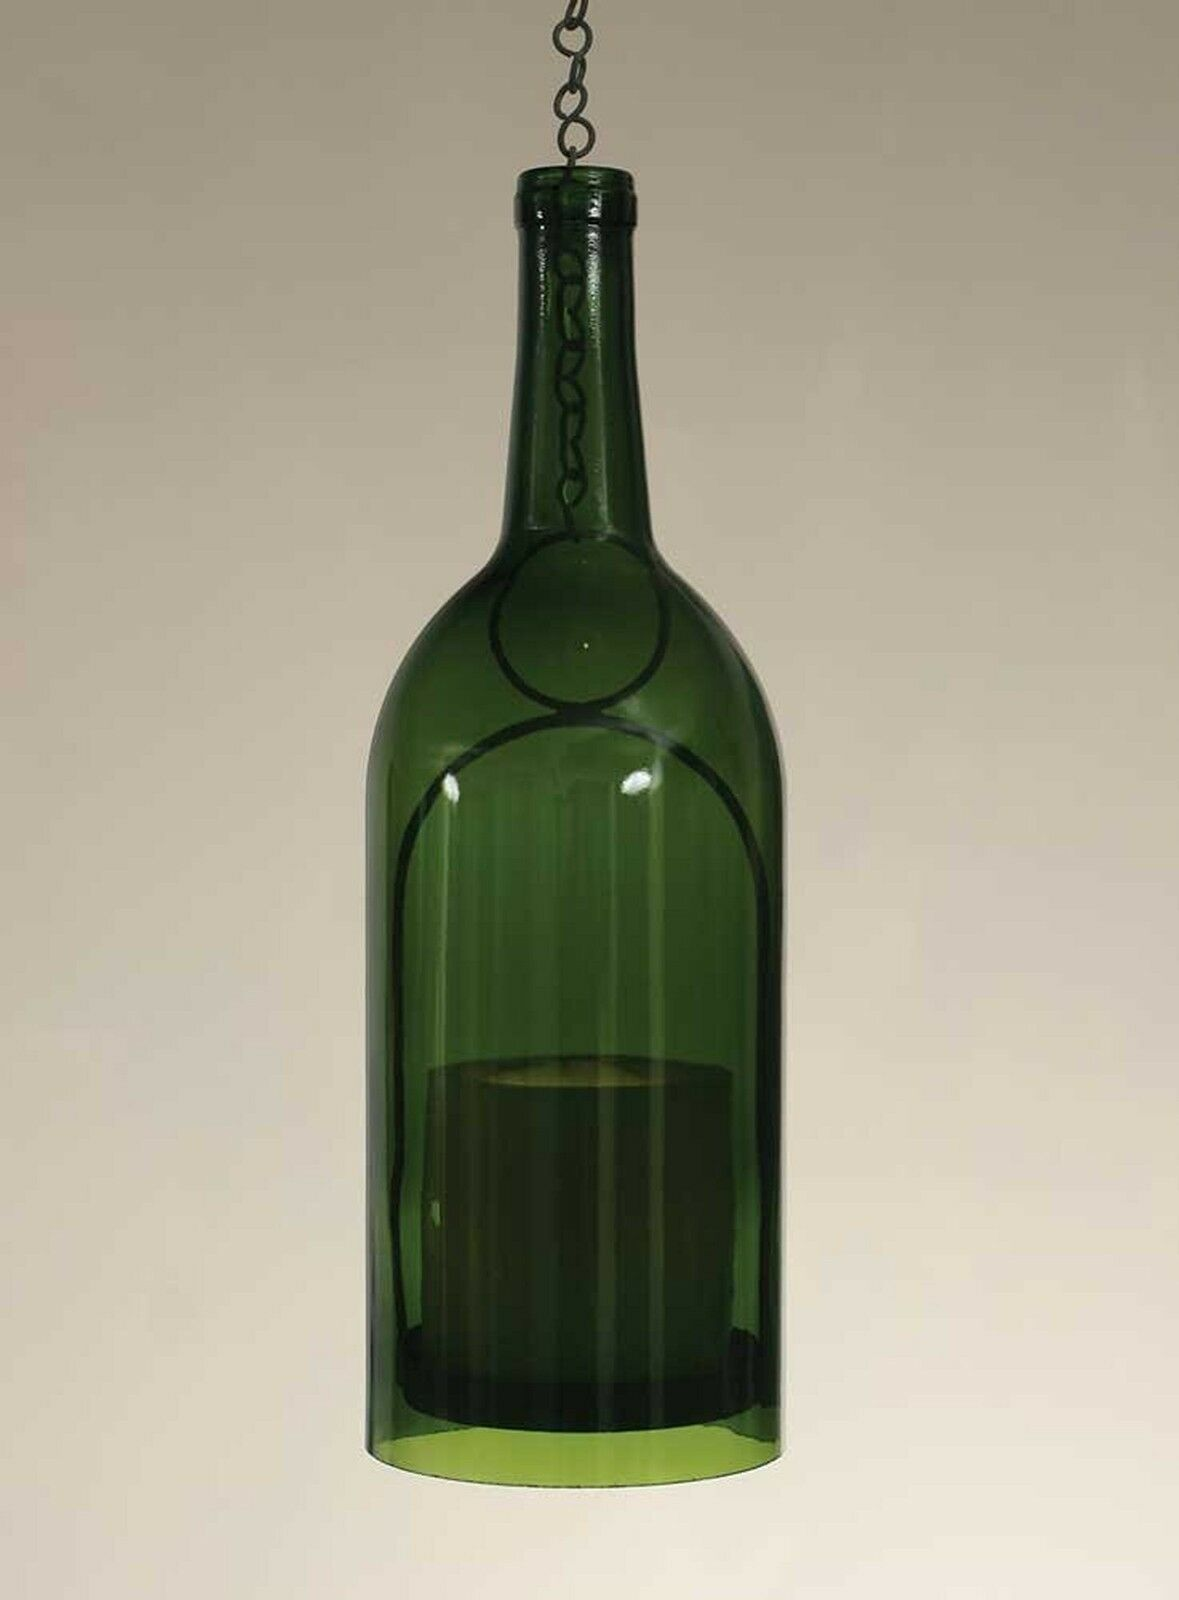 1.5 Liter Wine Bottle Hanging Pillar Candle Holder - Emerald Green Bottle